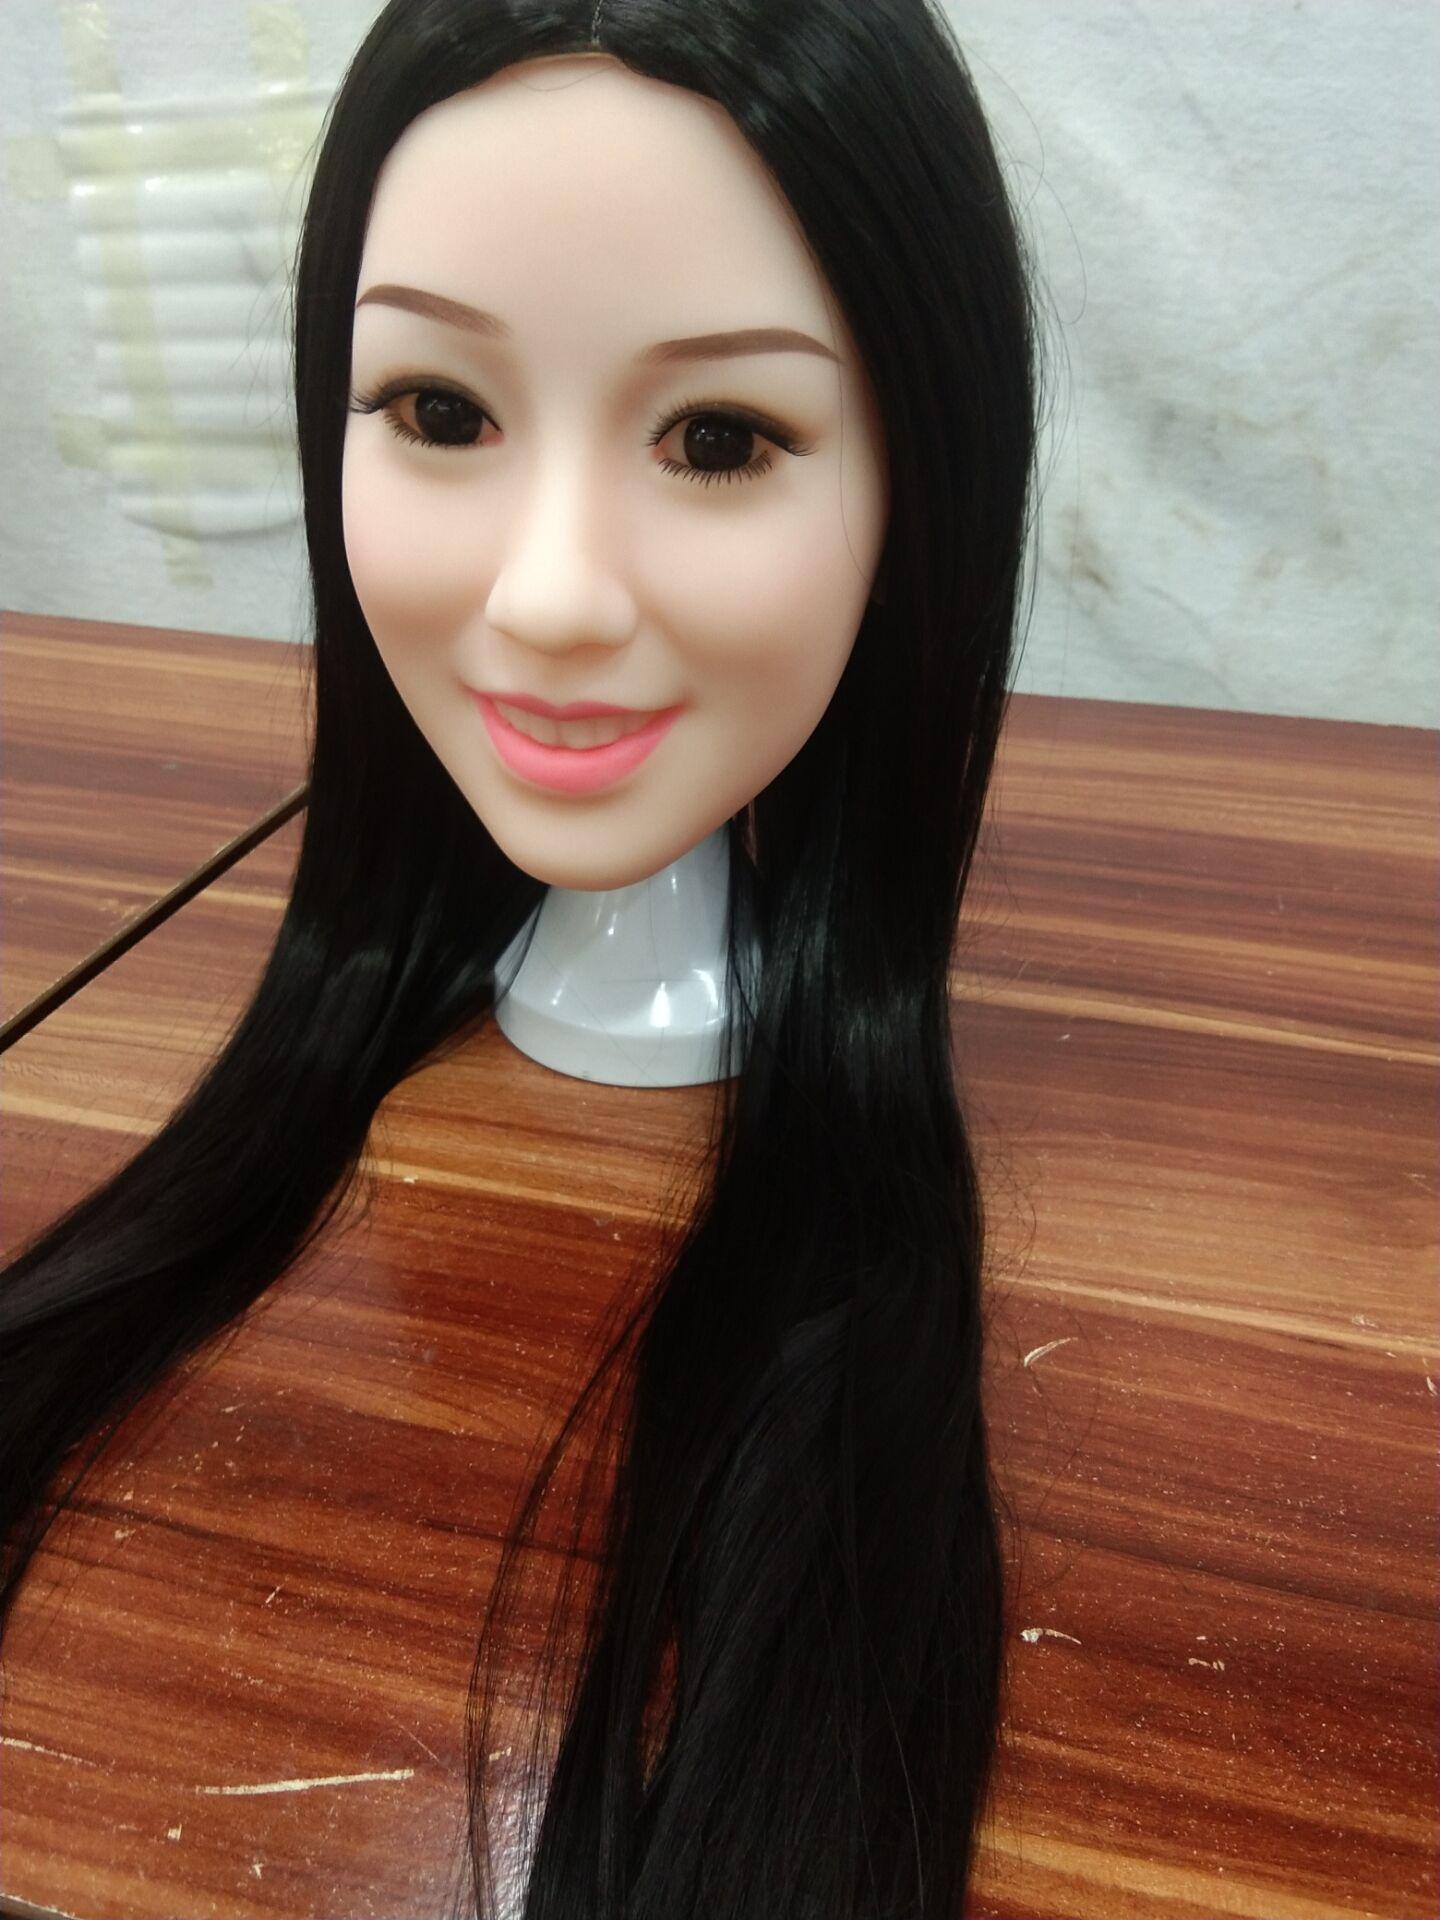 Cabeza de muñecas de silicona real japonesa, muñecas de amor humano real, cabeza de muñeca sexual China oral TPE